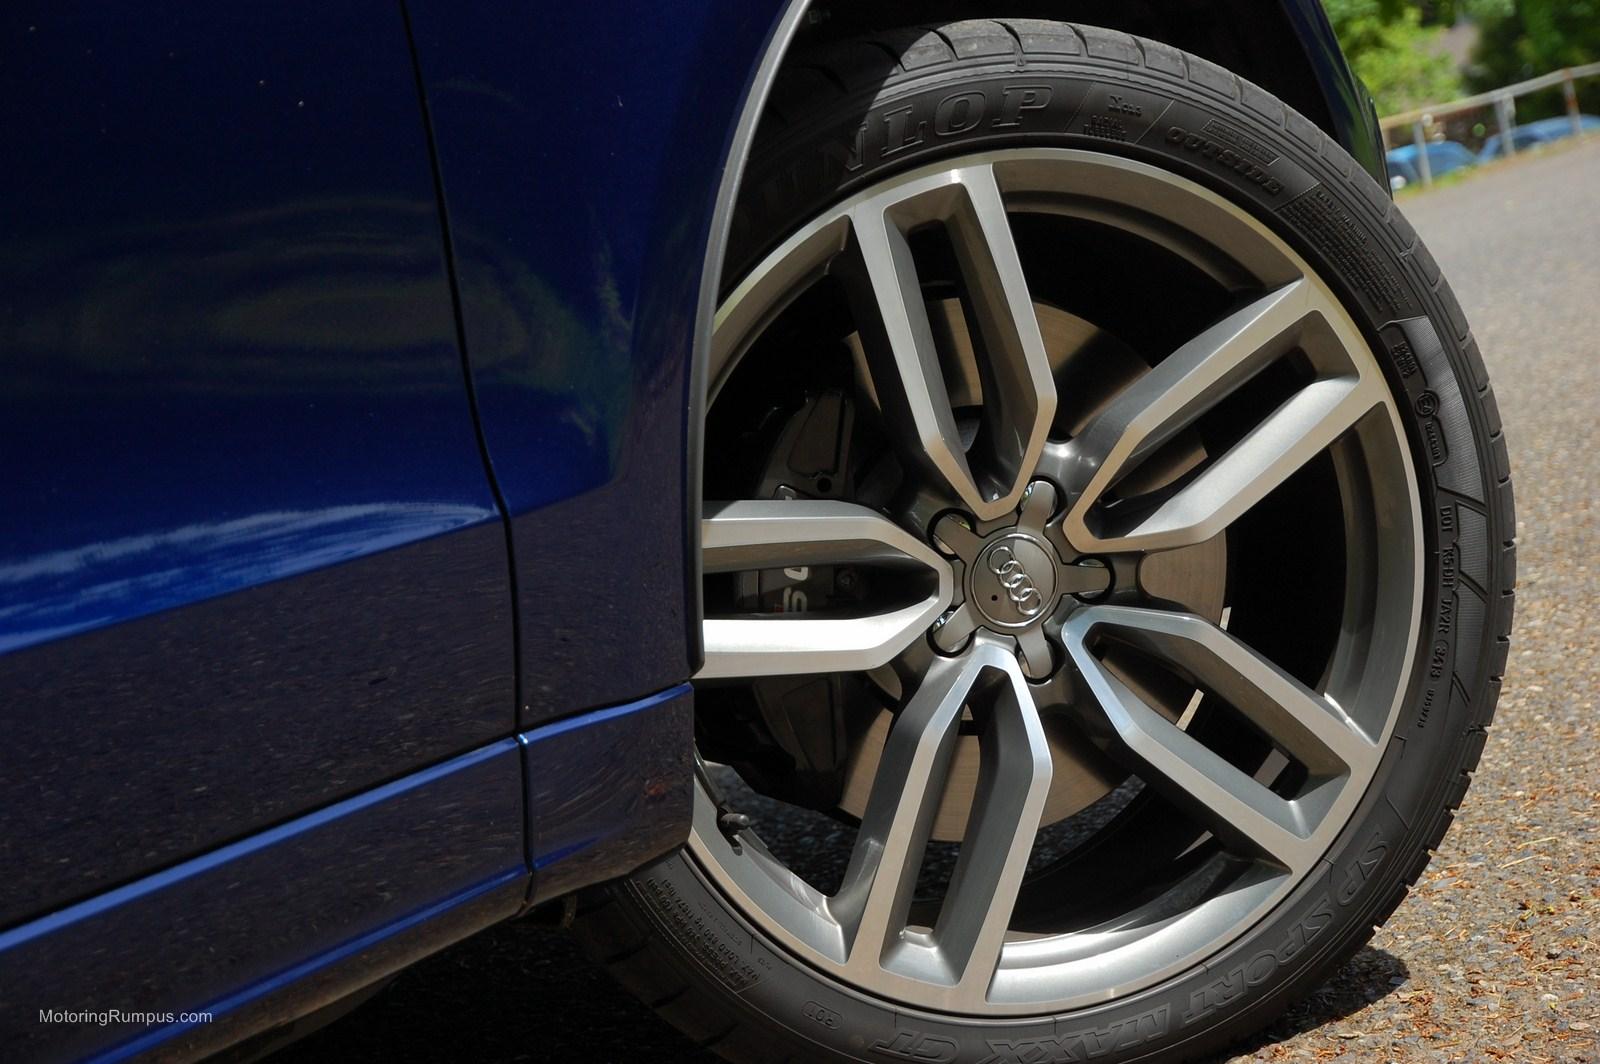 2014 Audi SQ5 21-inch 5-Double-Spoke Star-Design Wheels